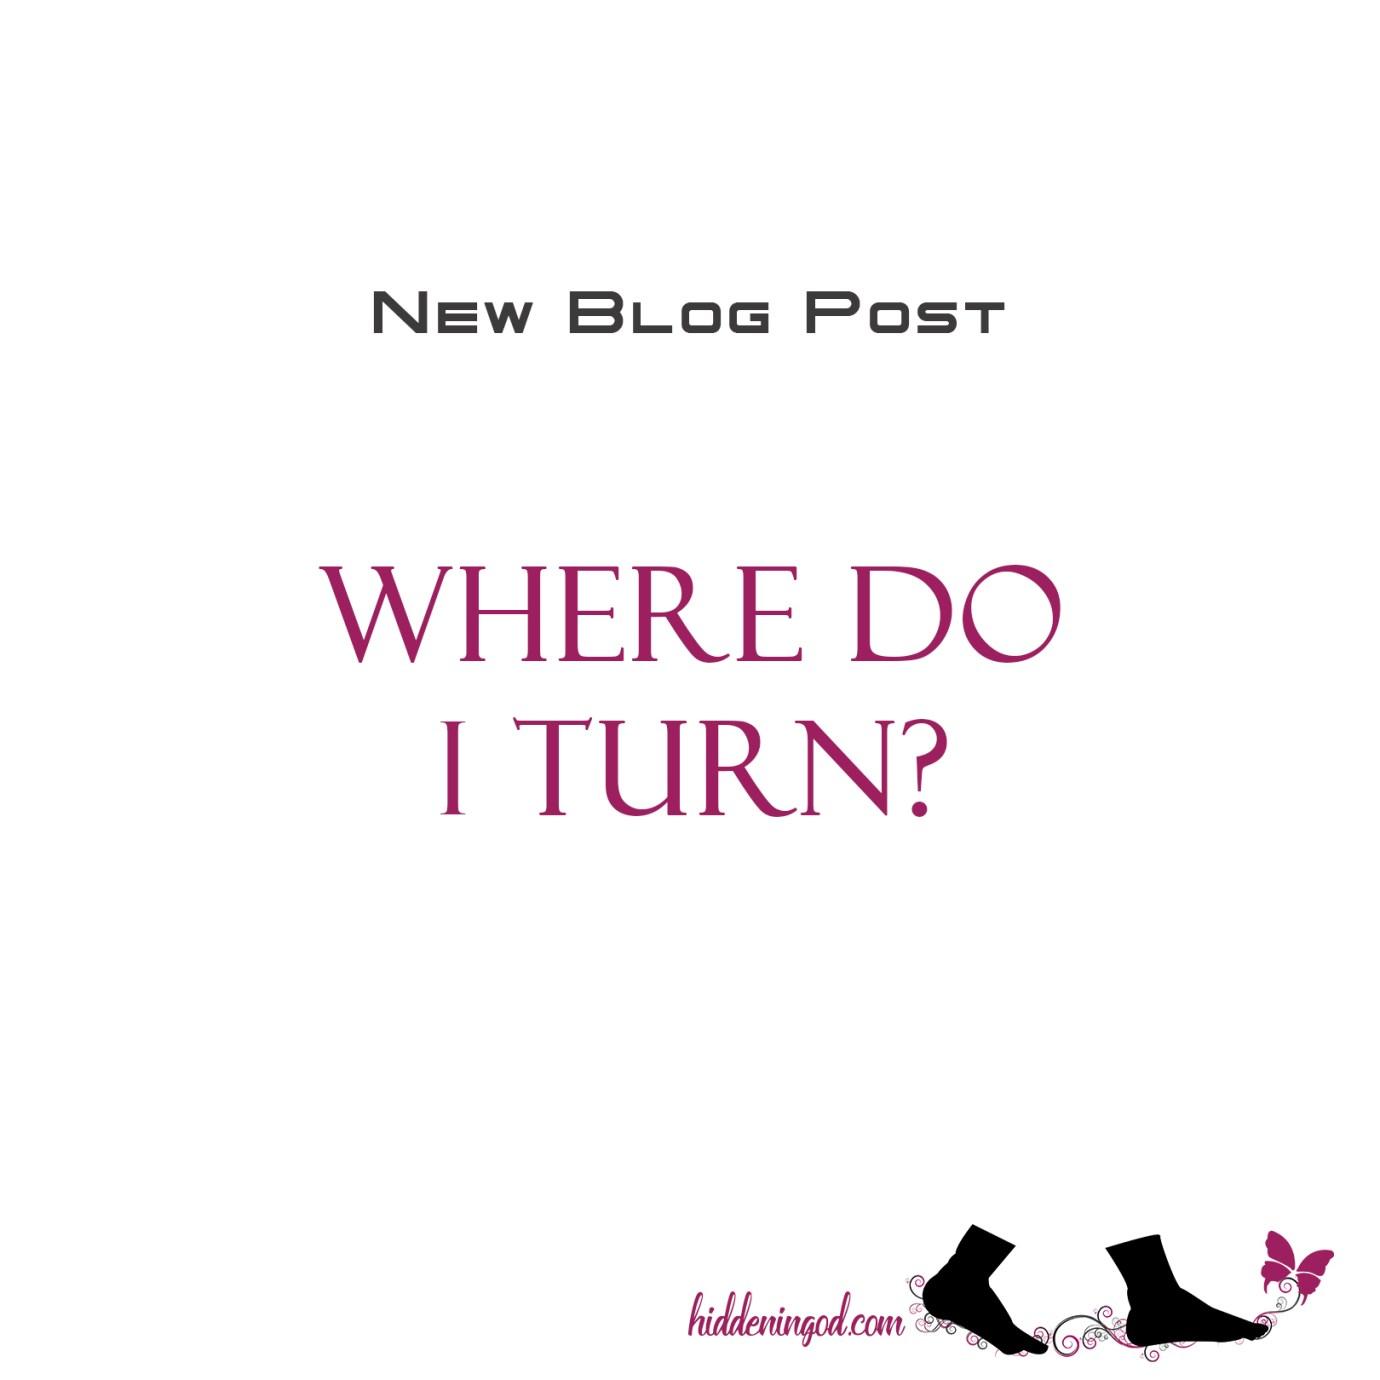 Where Do I Turn